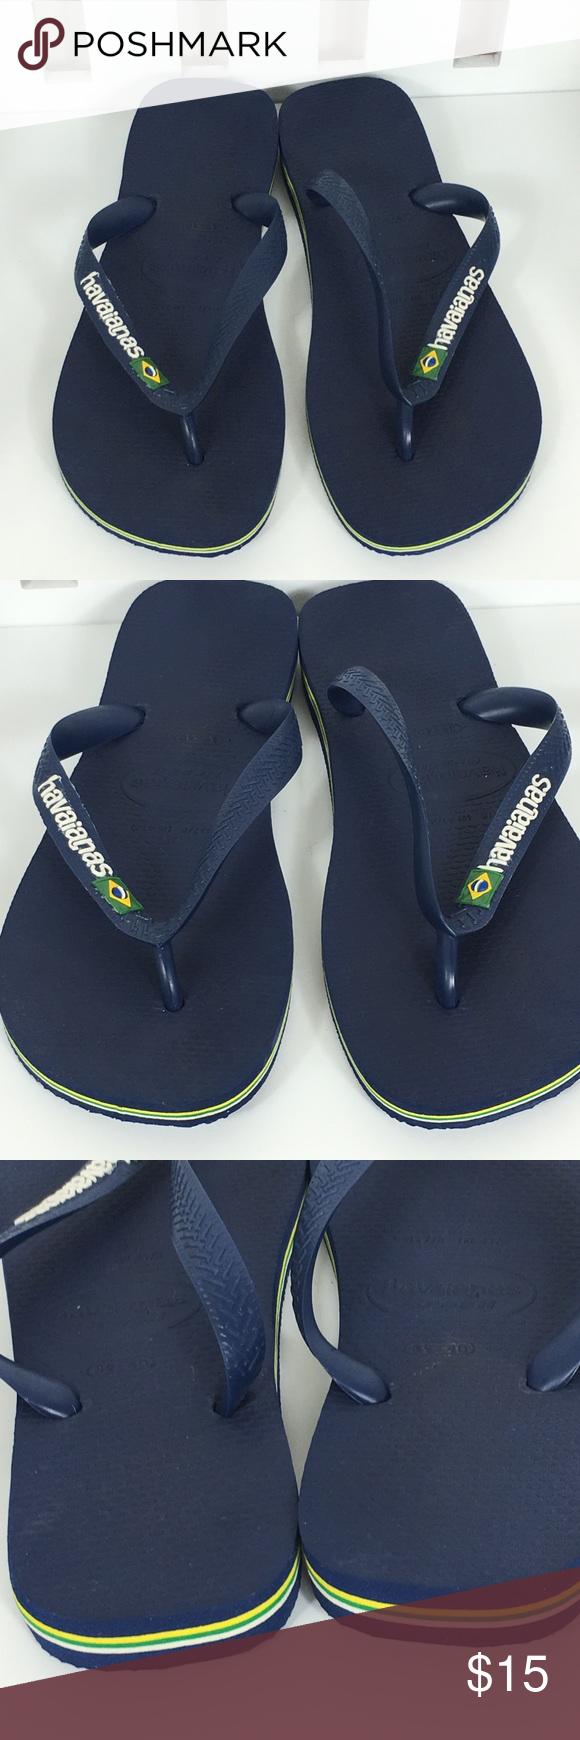 e4e46f7bca06 Havaianas flip flops for men Navy blue with hints of green